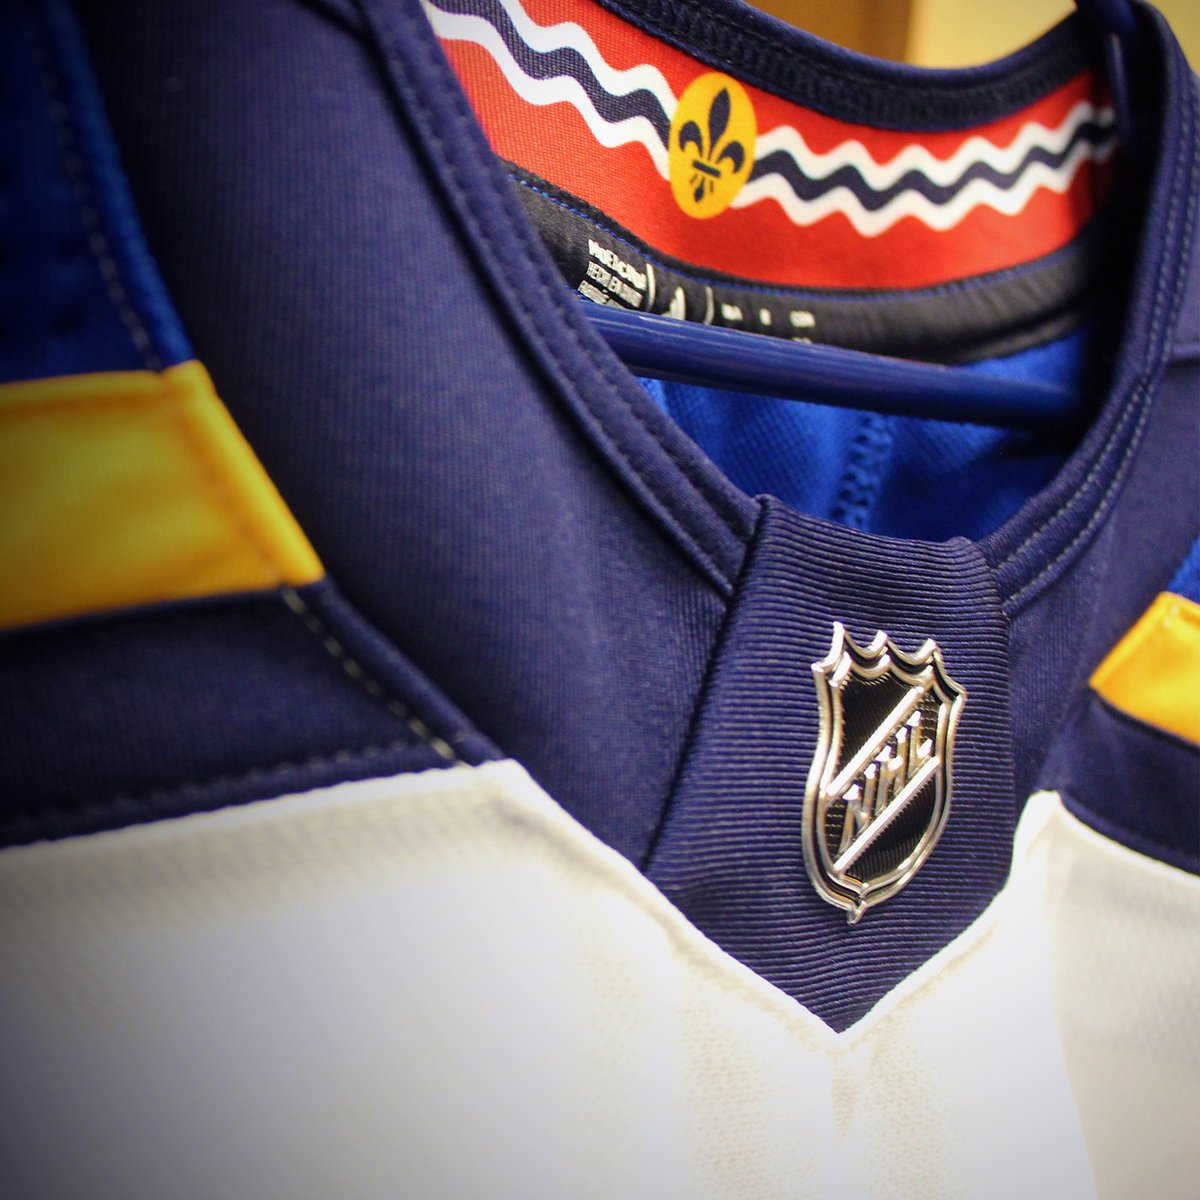 😍 @adidashockey #FormTheFuture #stlblues https://t.co/LsghqUQa7l